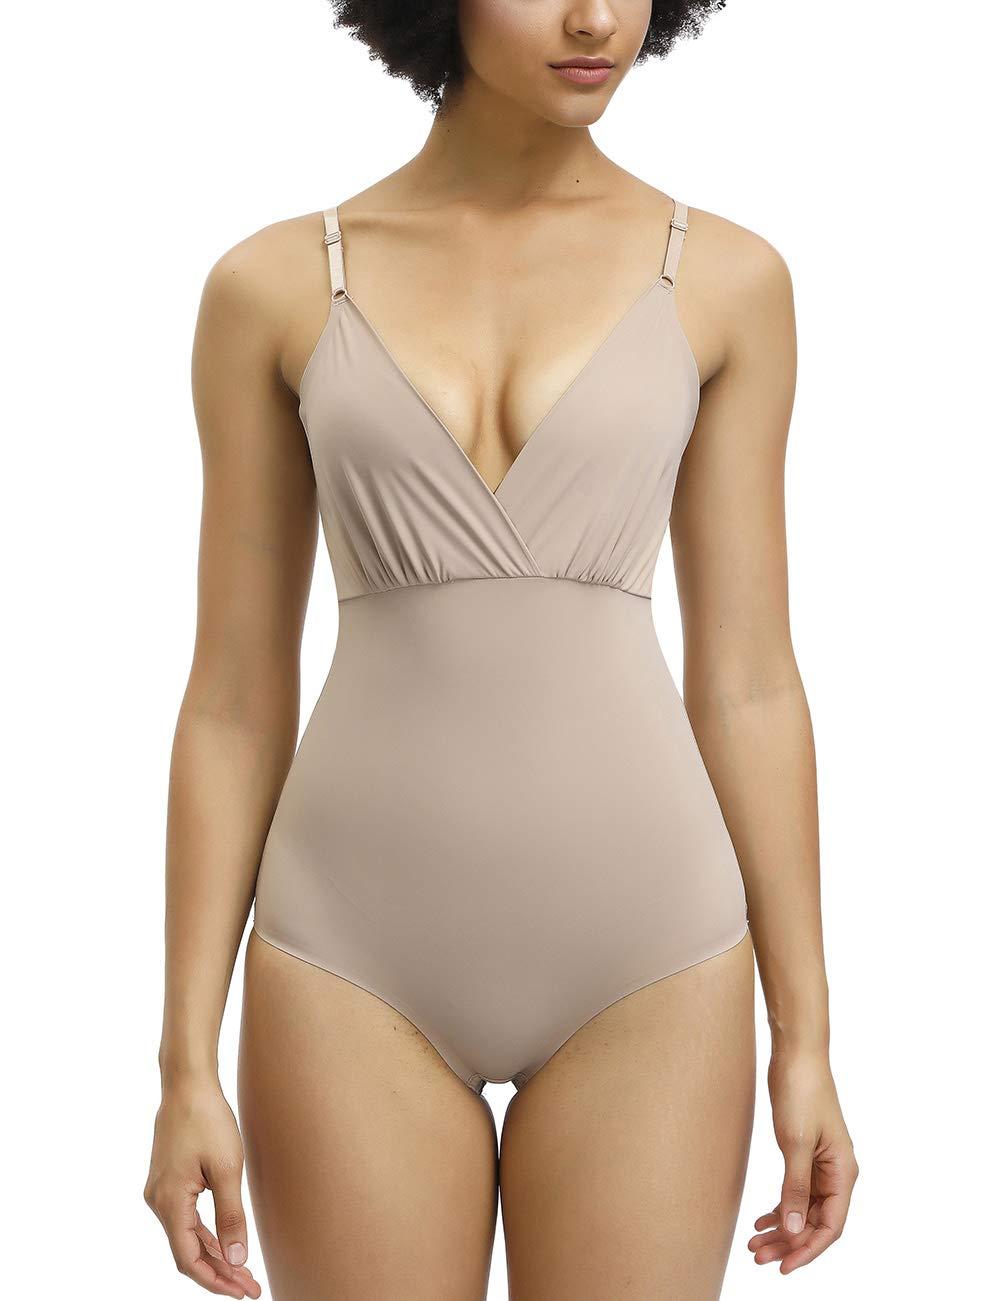 FEDNON Women Comfort Control Shapewear Seamless v Neck Smooth Full Body Shaper